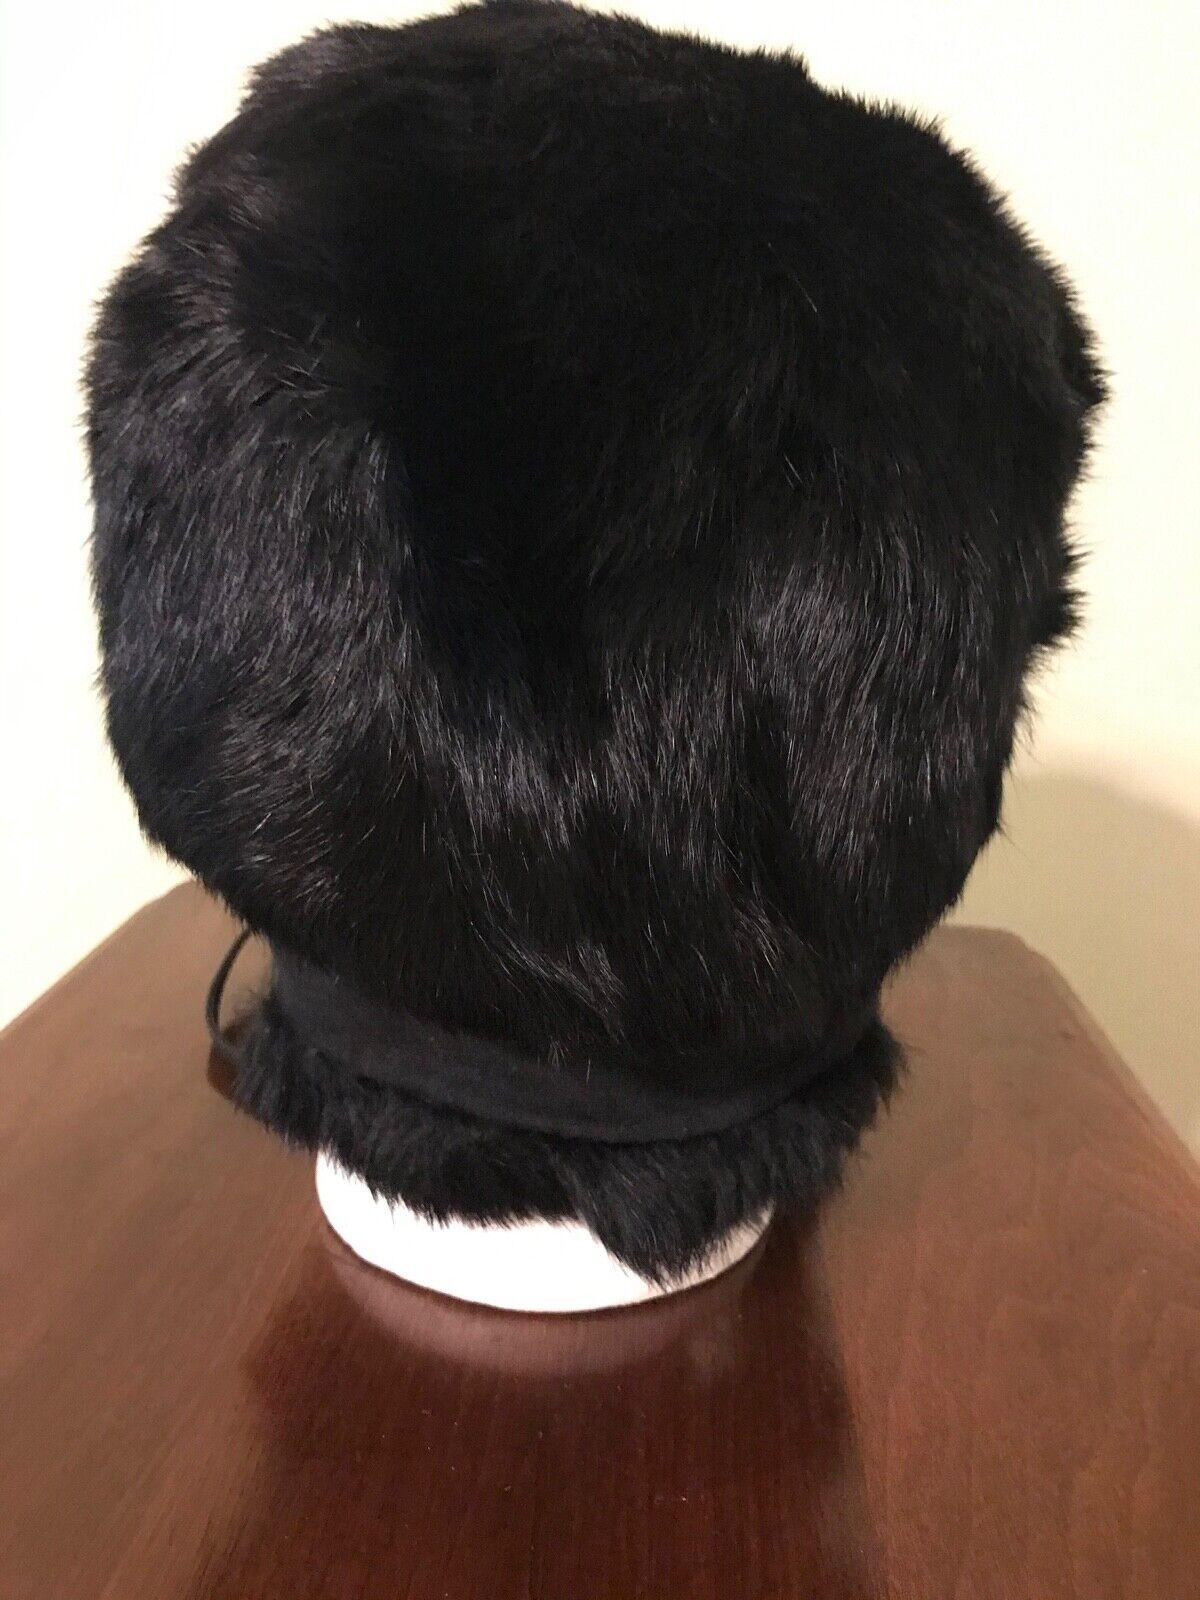 Vintage Black Mink Ladies' Hat with Flap Ear Muffs - image 7